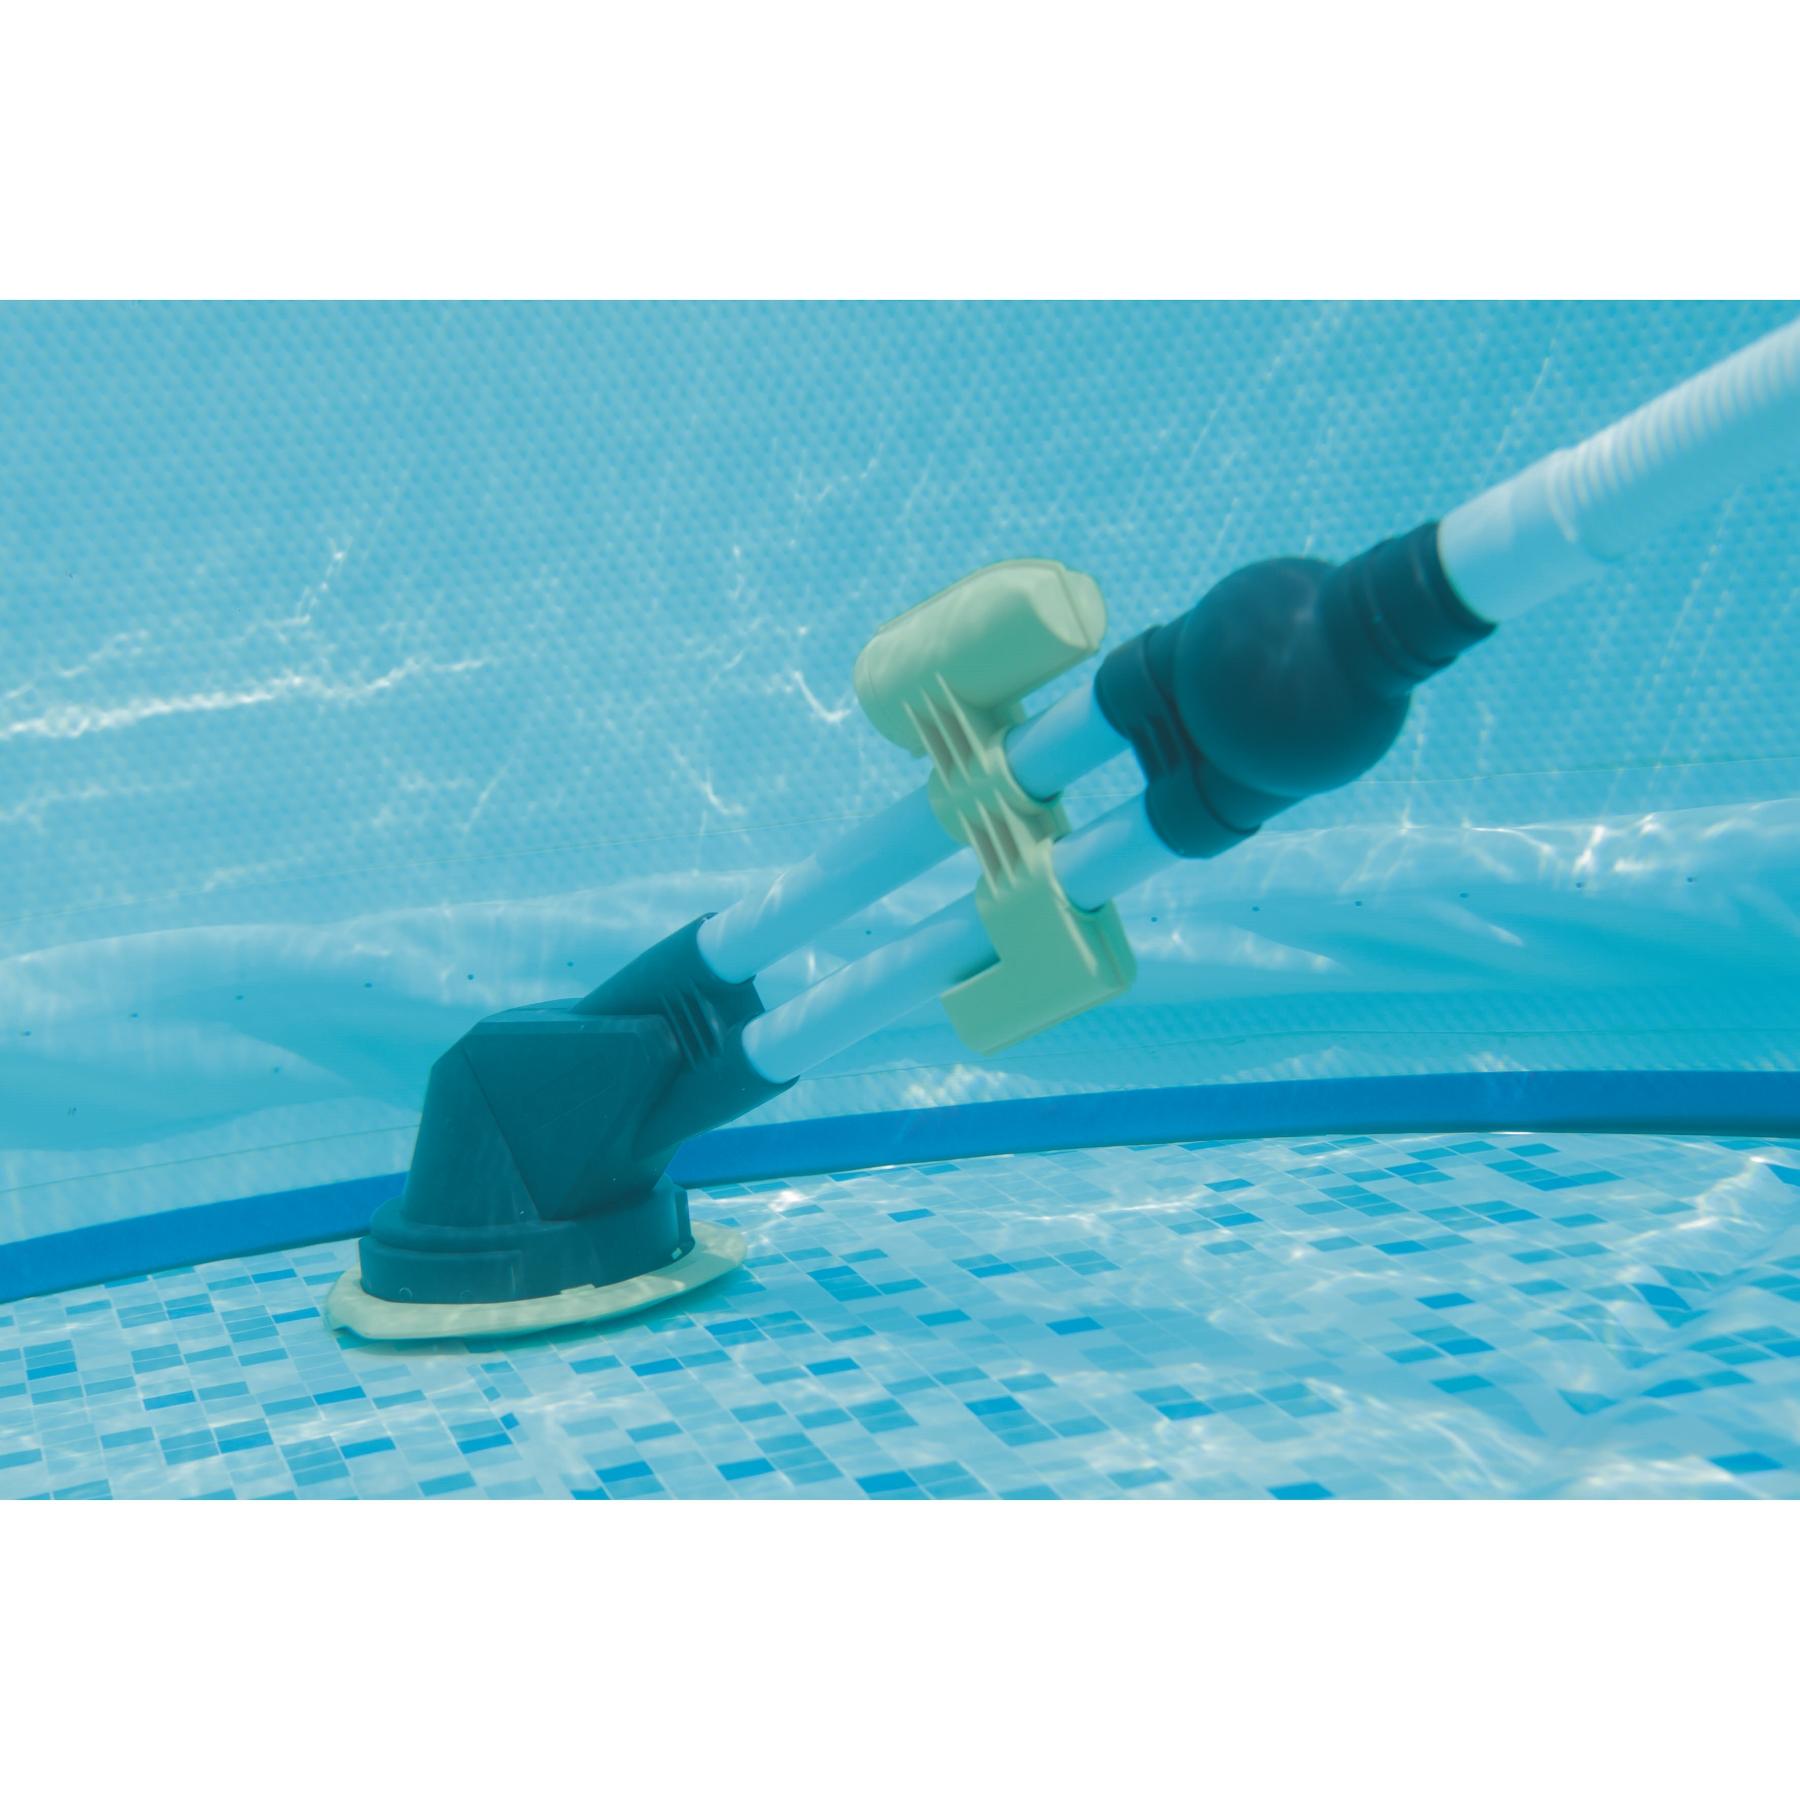 Pulitore bestway aquaclimb per piscine ferramenta for Pulitore piscina bestway